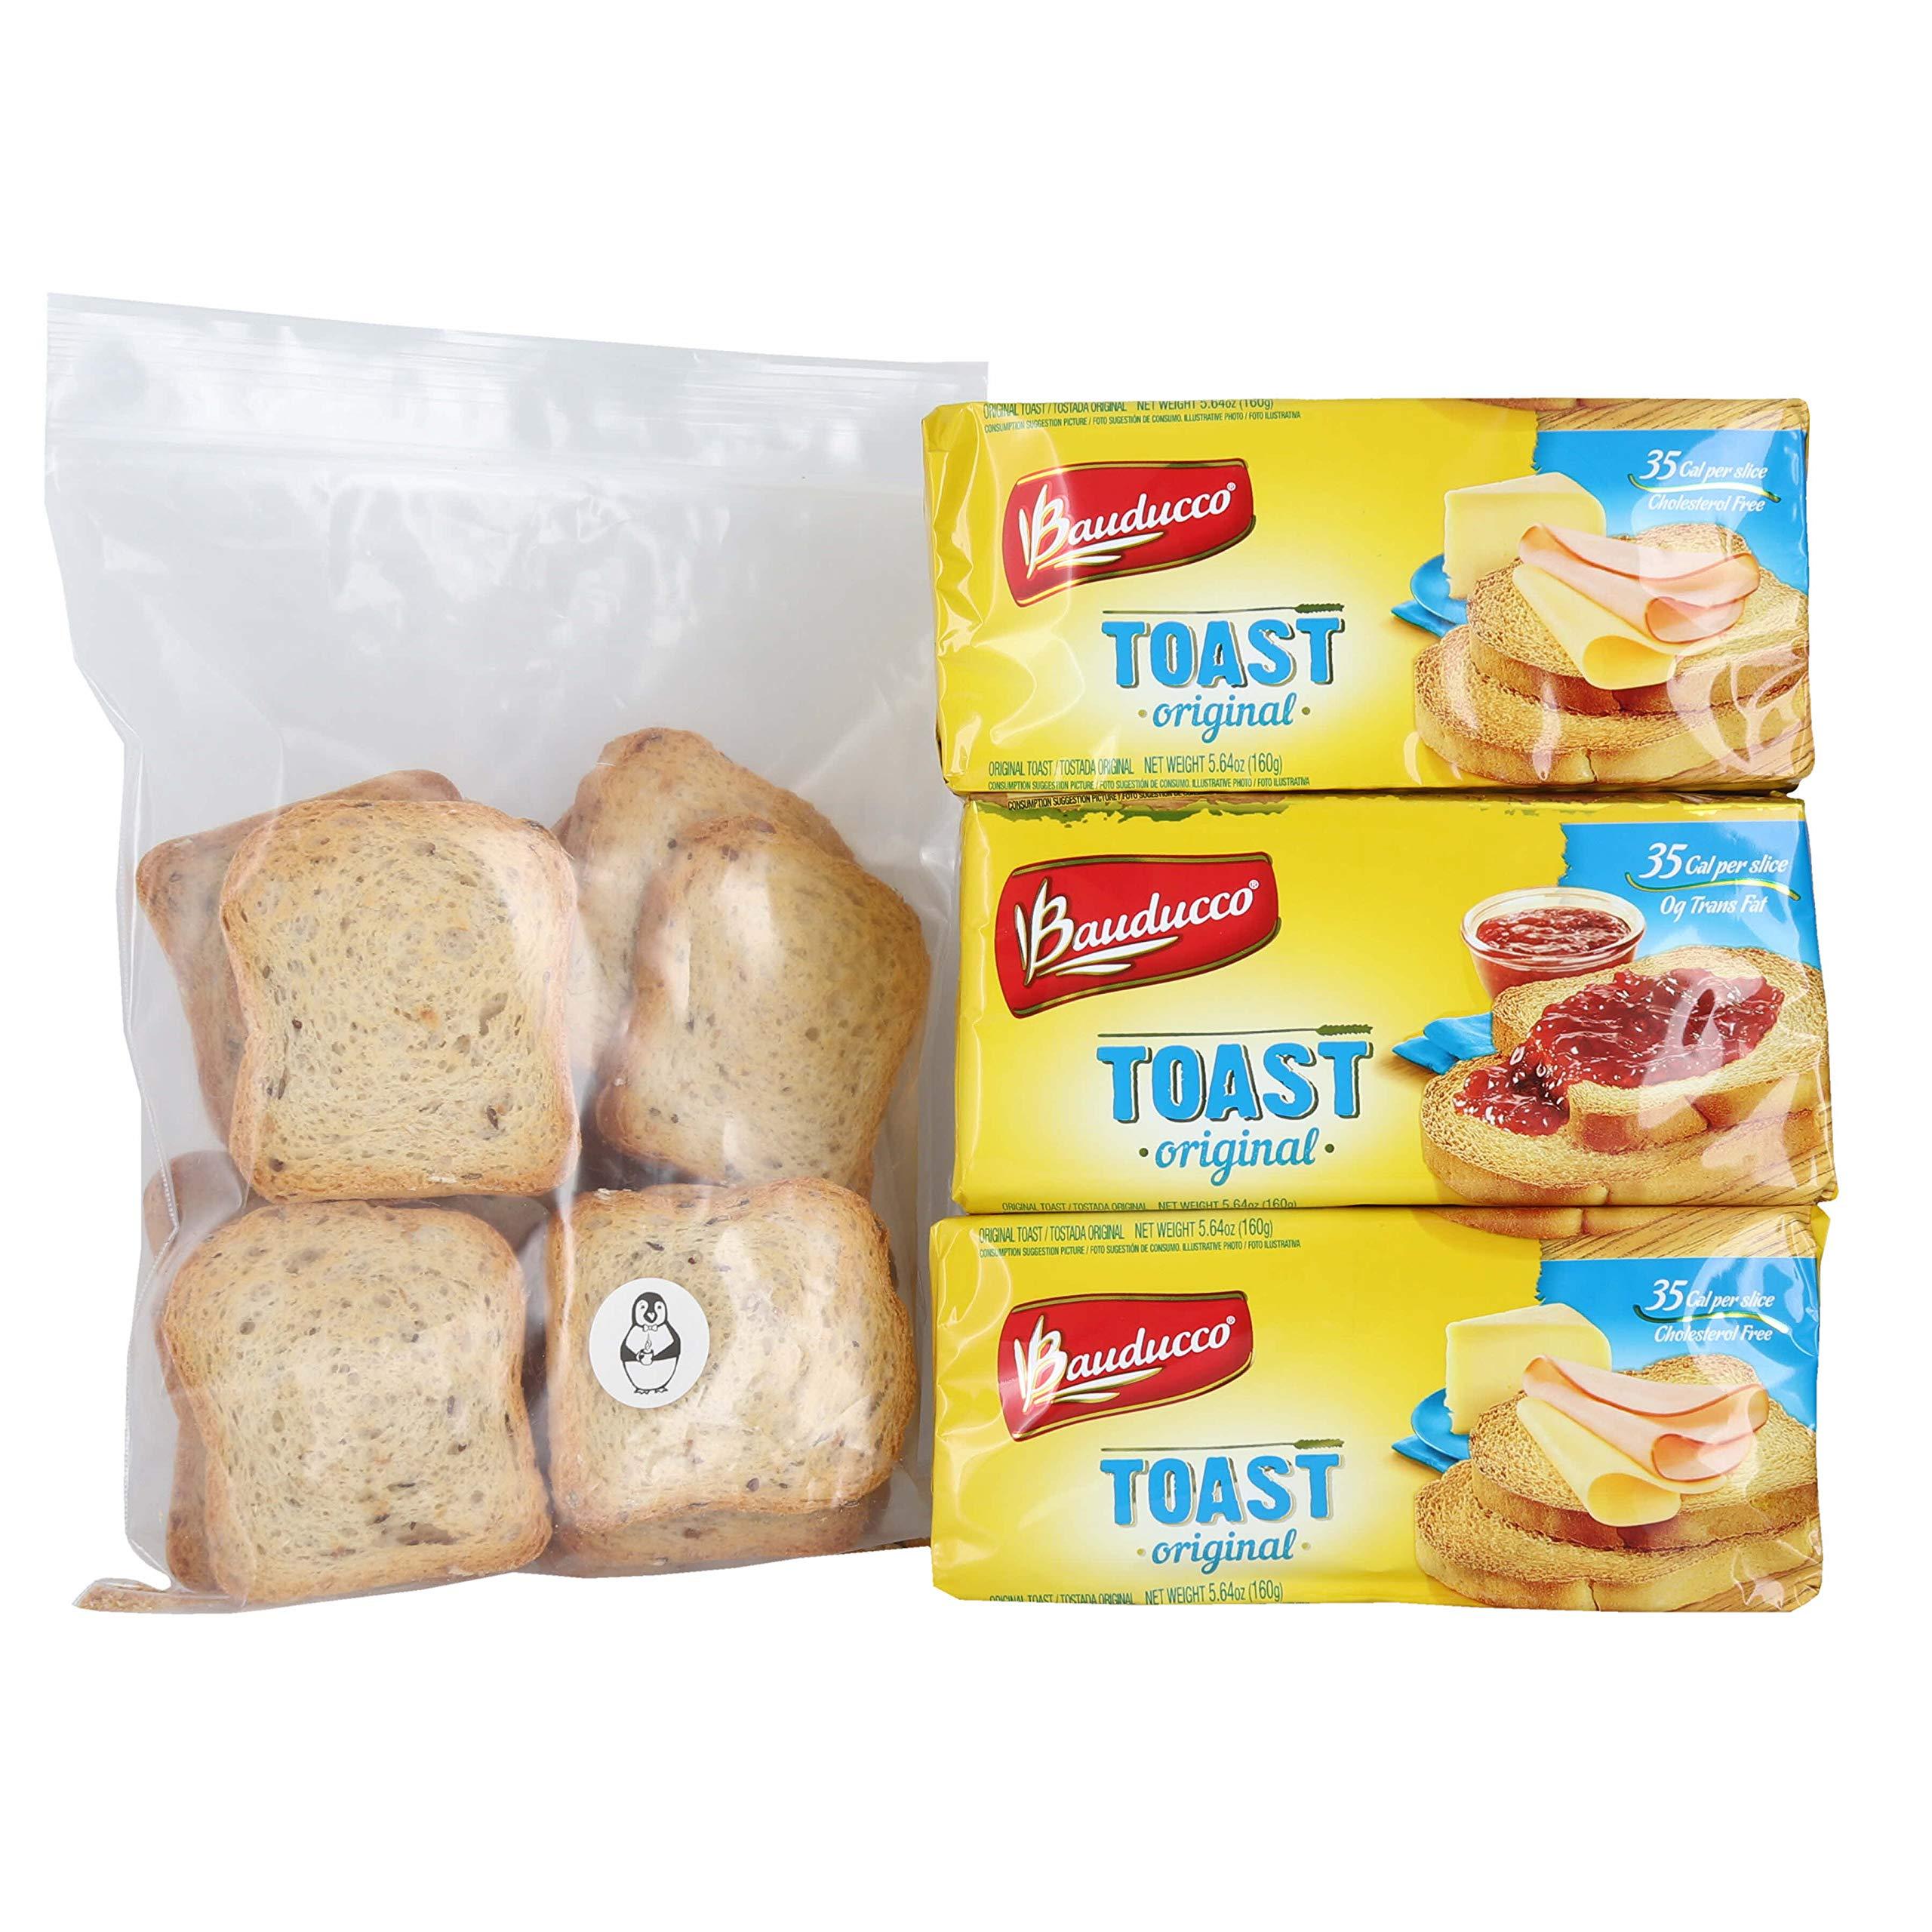 Bauducco Original Toast - (3 Pack) W/ Premium Penguin Quick Storage Pouch by Bauducco